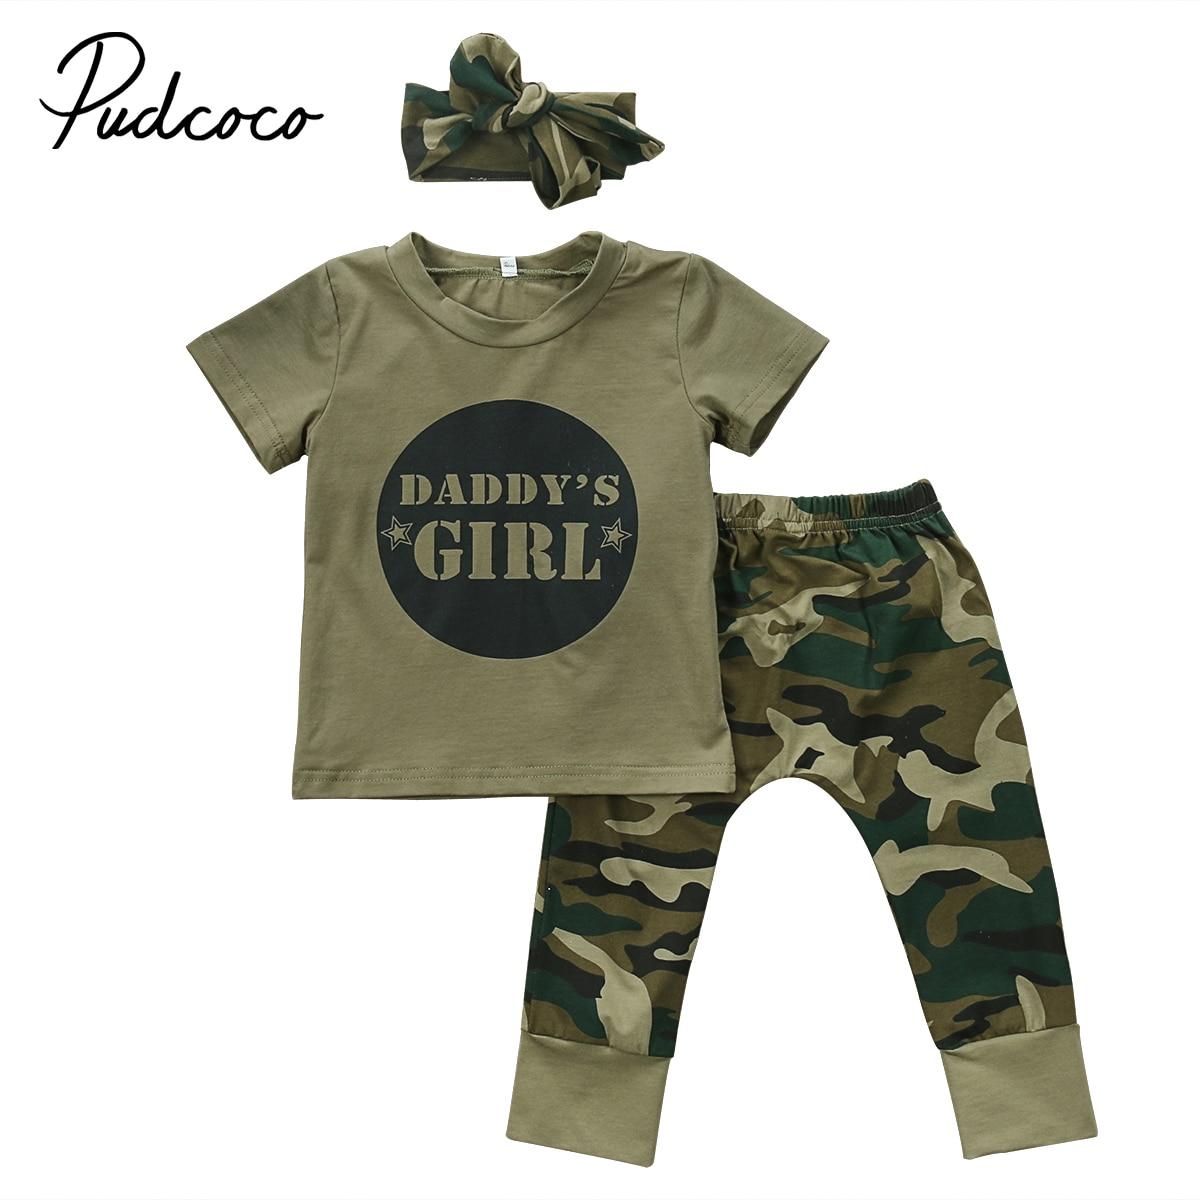 Newborn Baby Boy Girl Camo T-shirt Tops Pants Outfits Set Clothes 0-24M